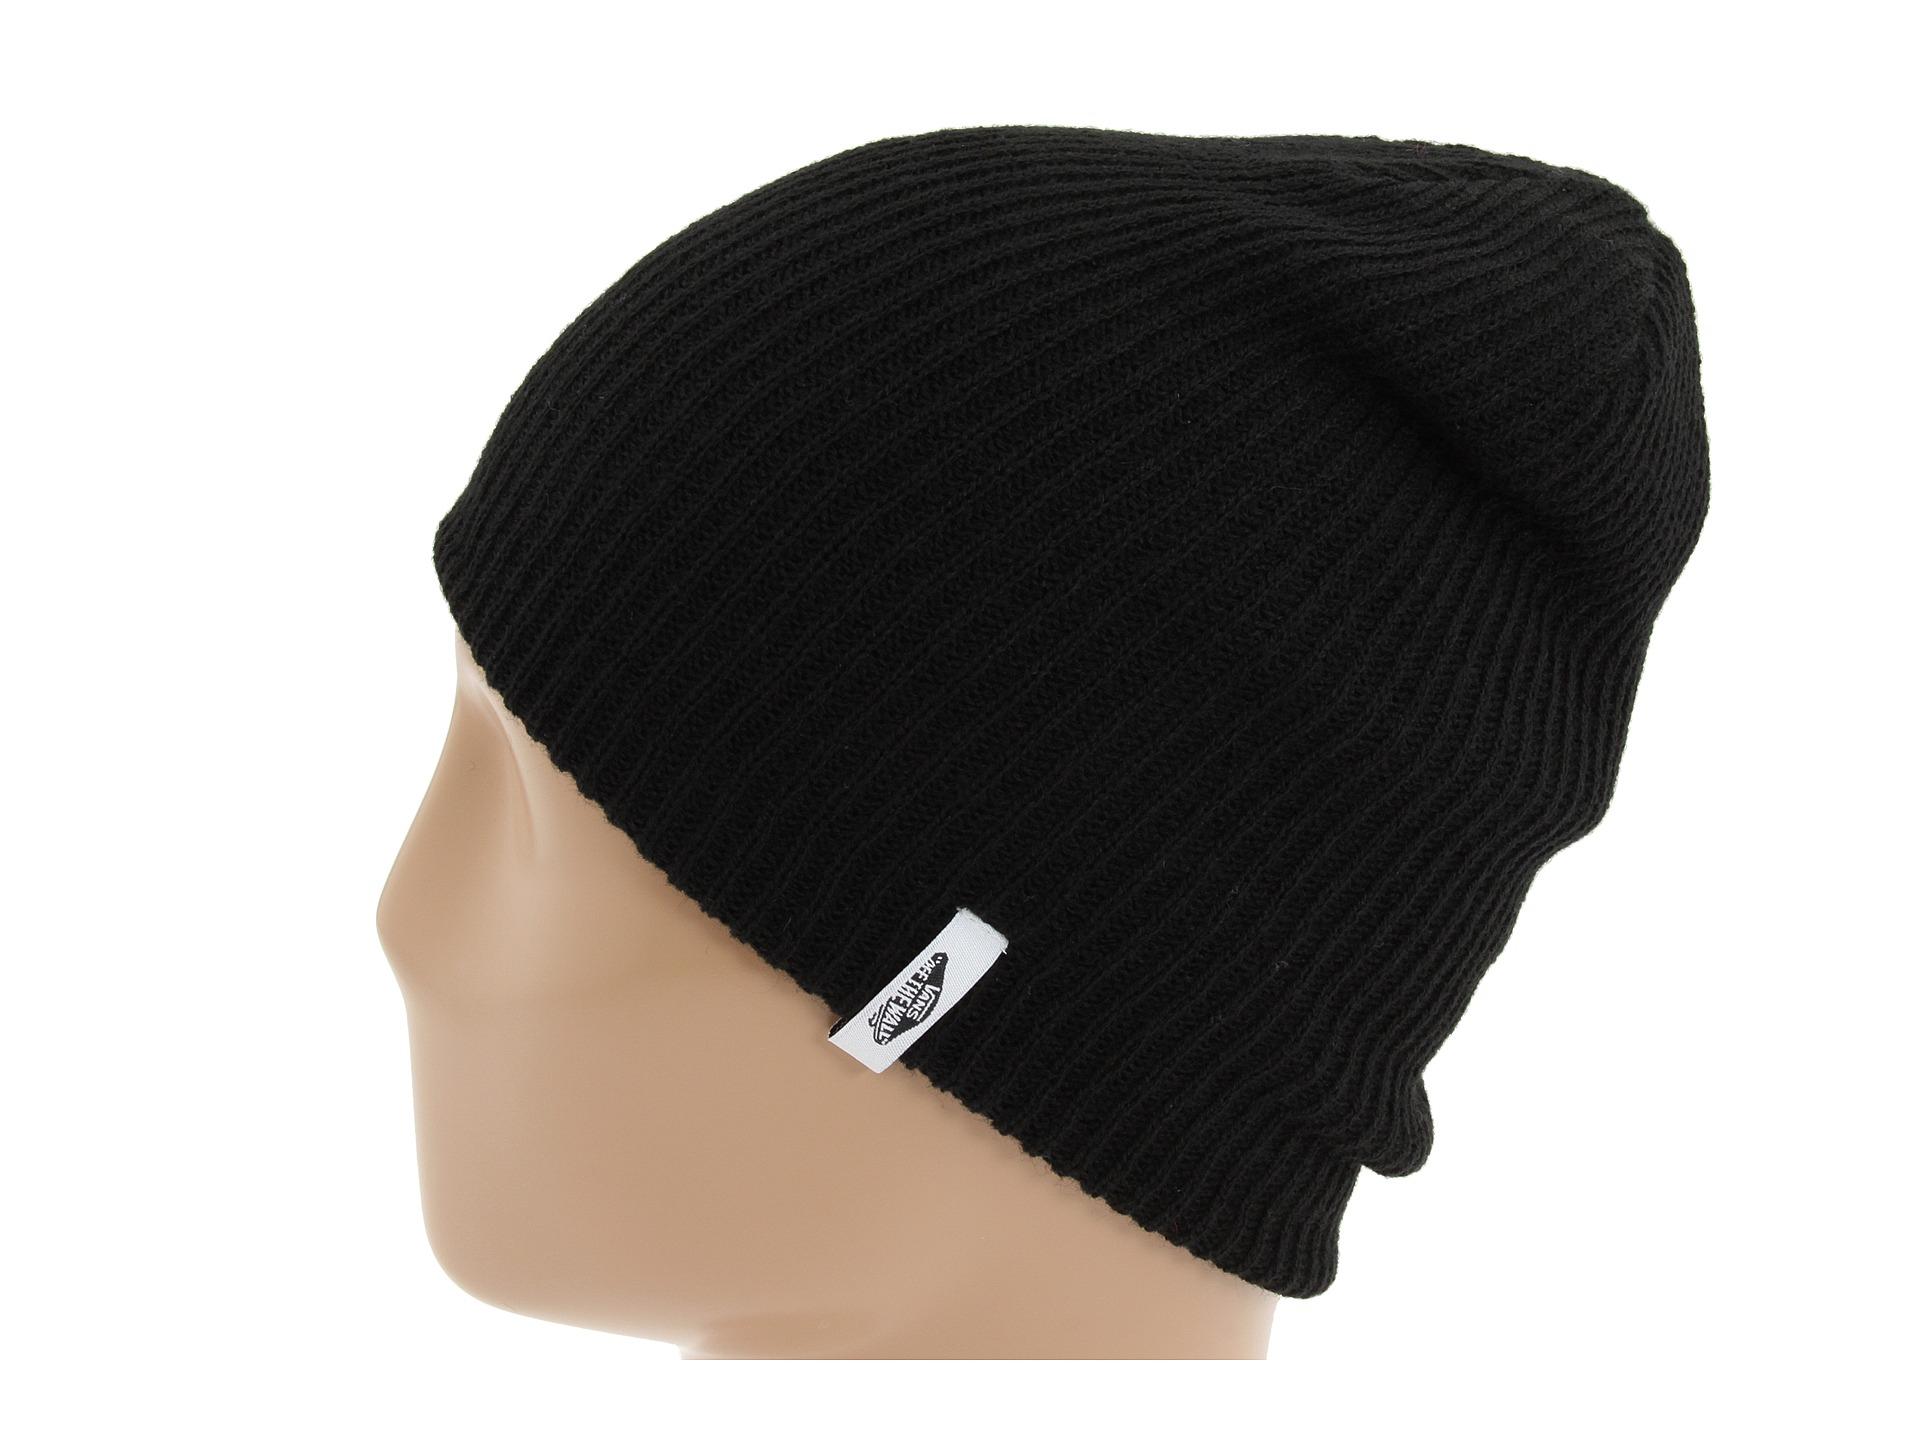 474a49a10c9b6 Lyst - Vans Mismoedig Beanie in Black for Men